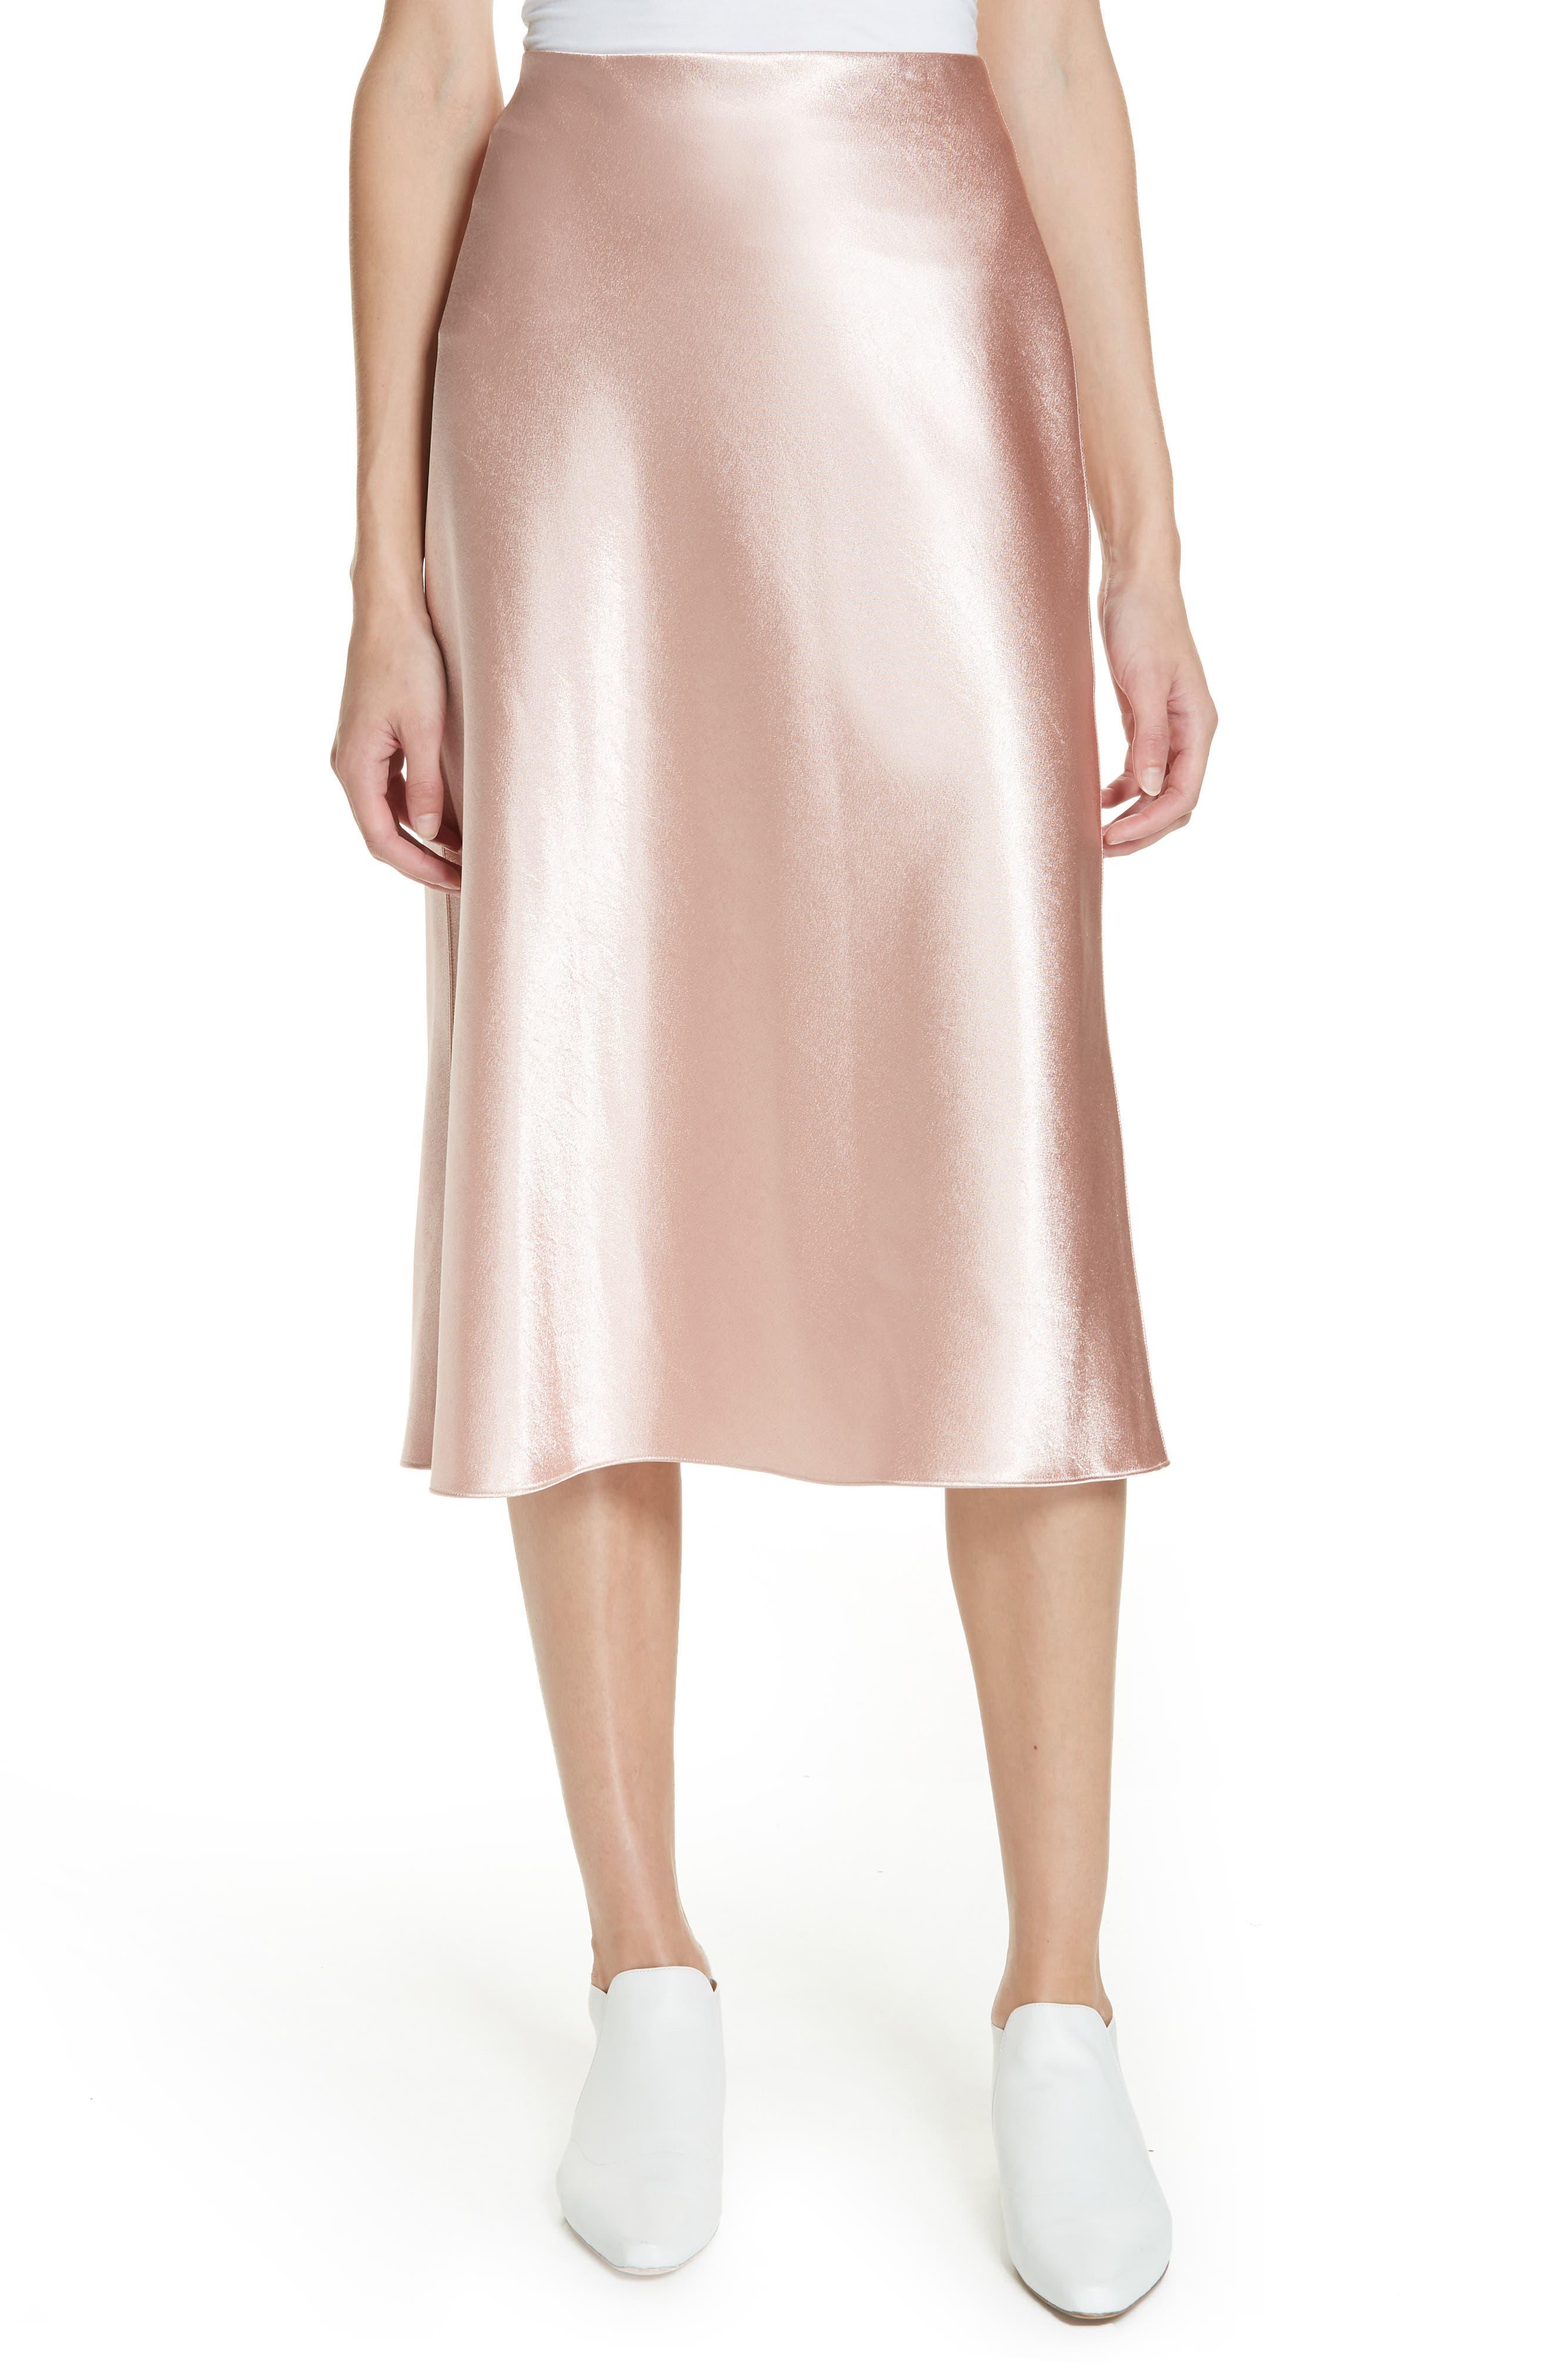 VINCE, Satin Slip Skirt, Main thumbnail 1, color, BLUSH